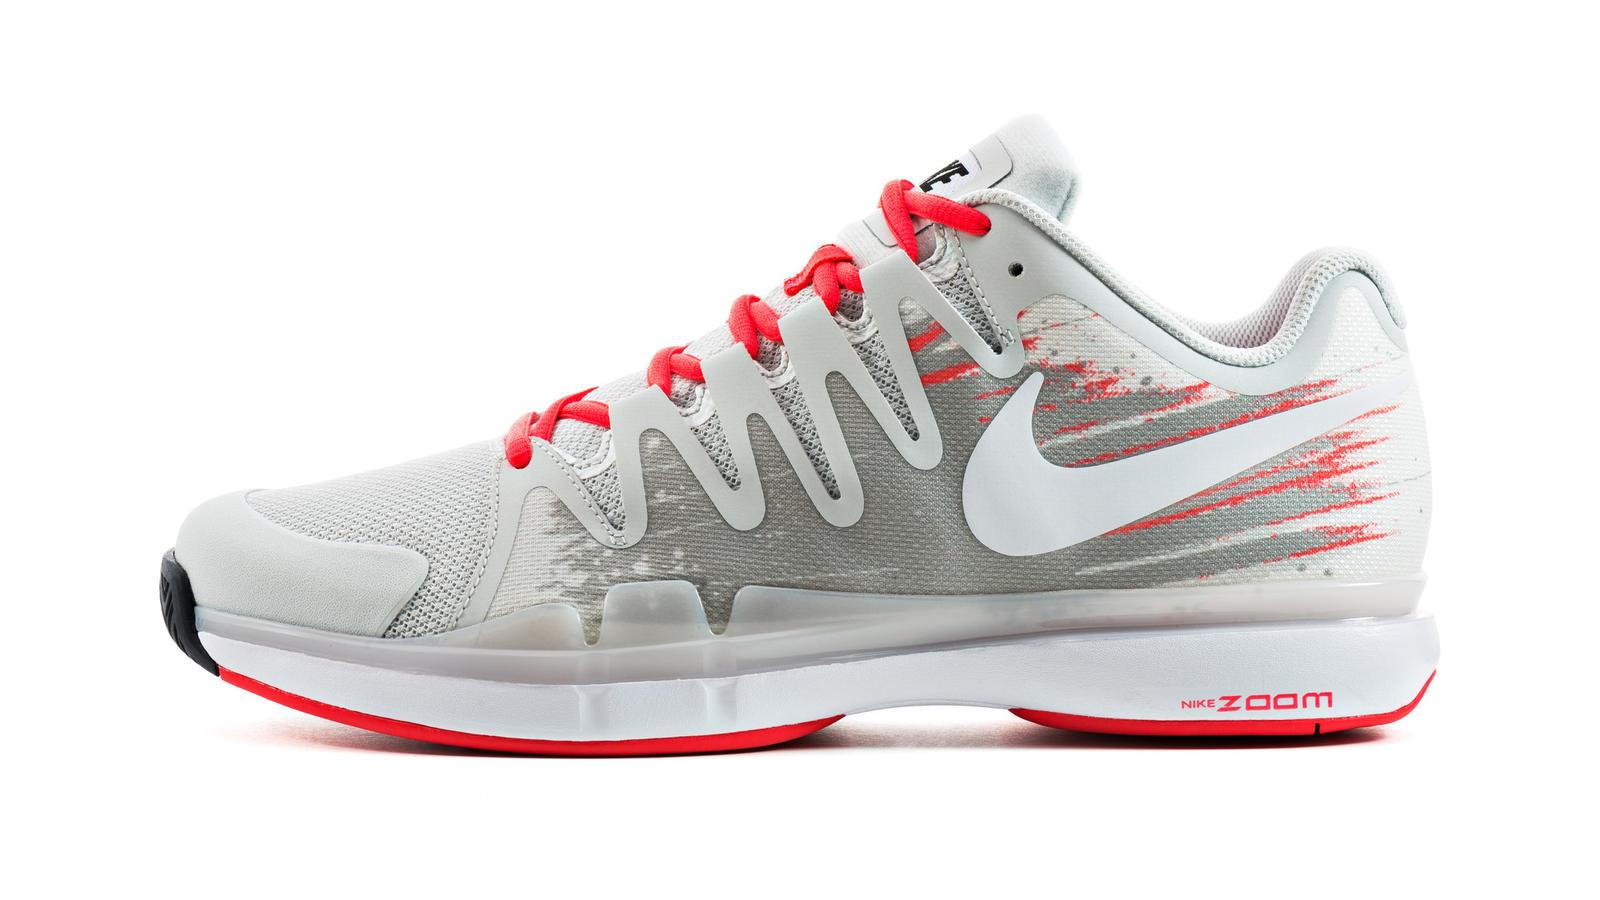 quality design 80194 eeb84 Nike Tennis Footwear - Women. Zoom Vapor Tour 9.5 - Mens